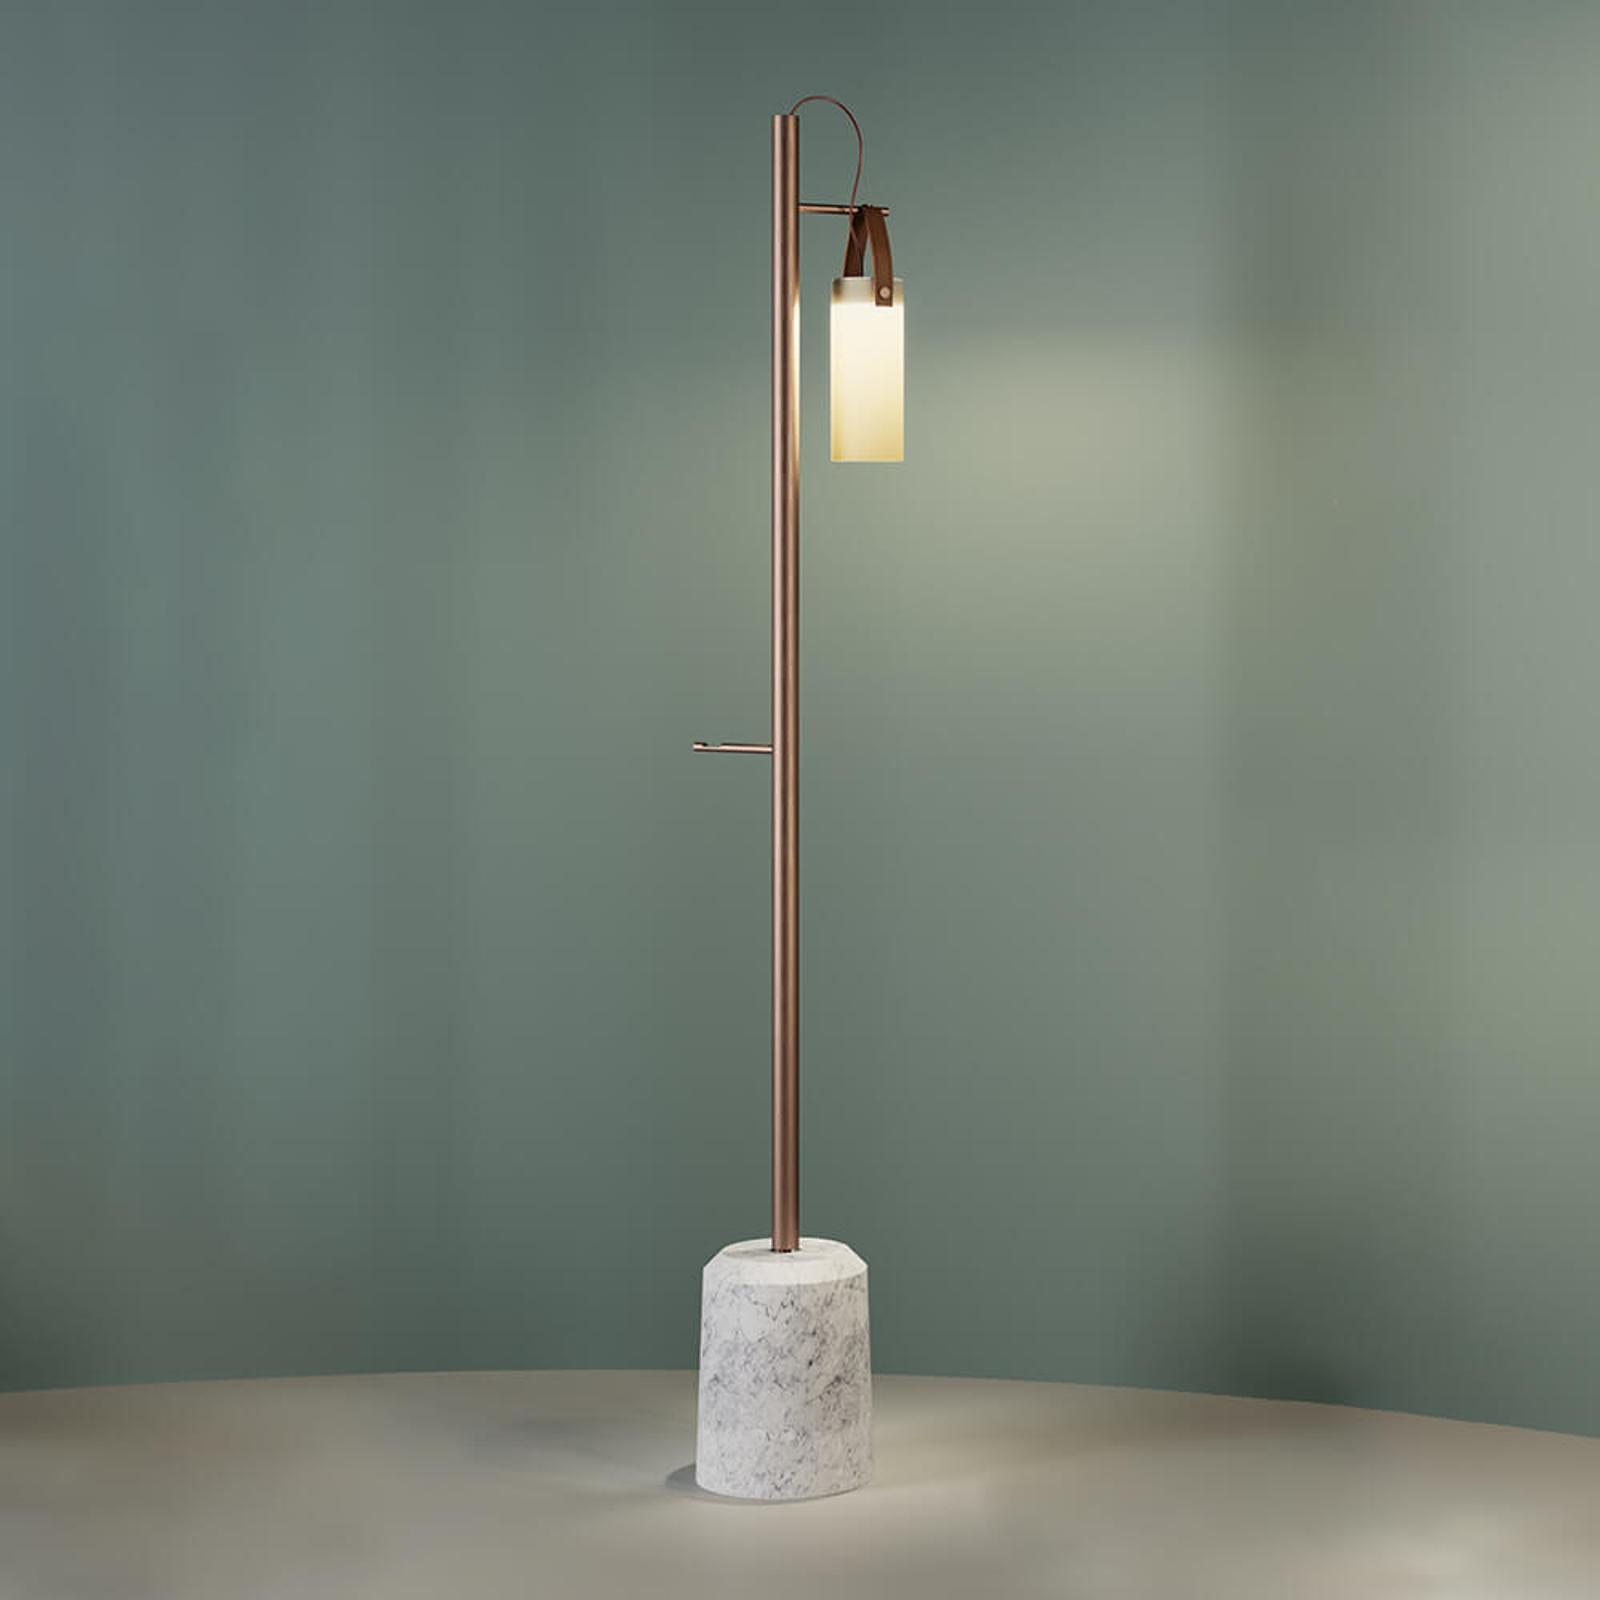 Designerska lampa stojąca LED Galerie, 1-punktowa